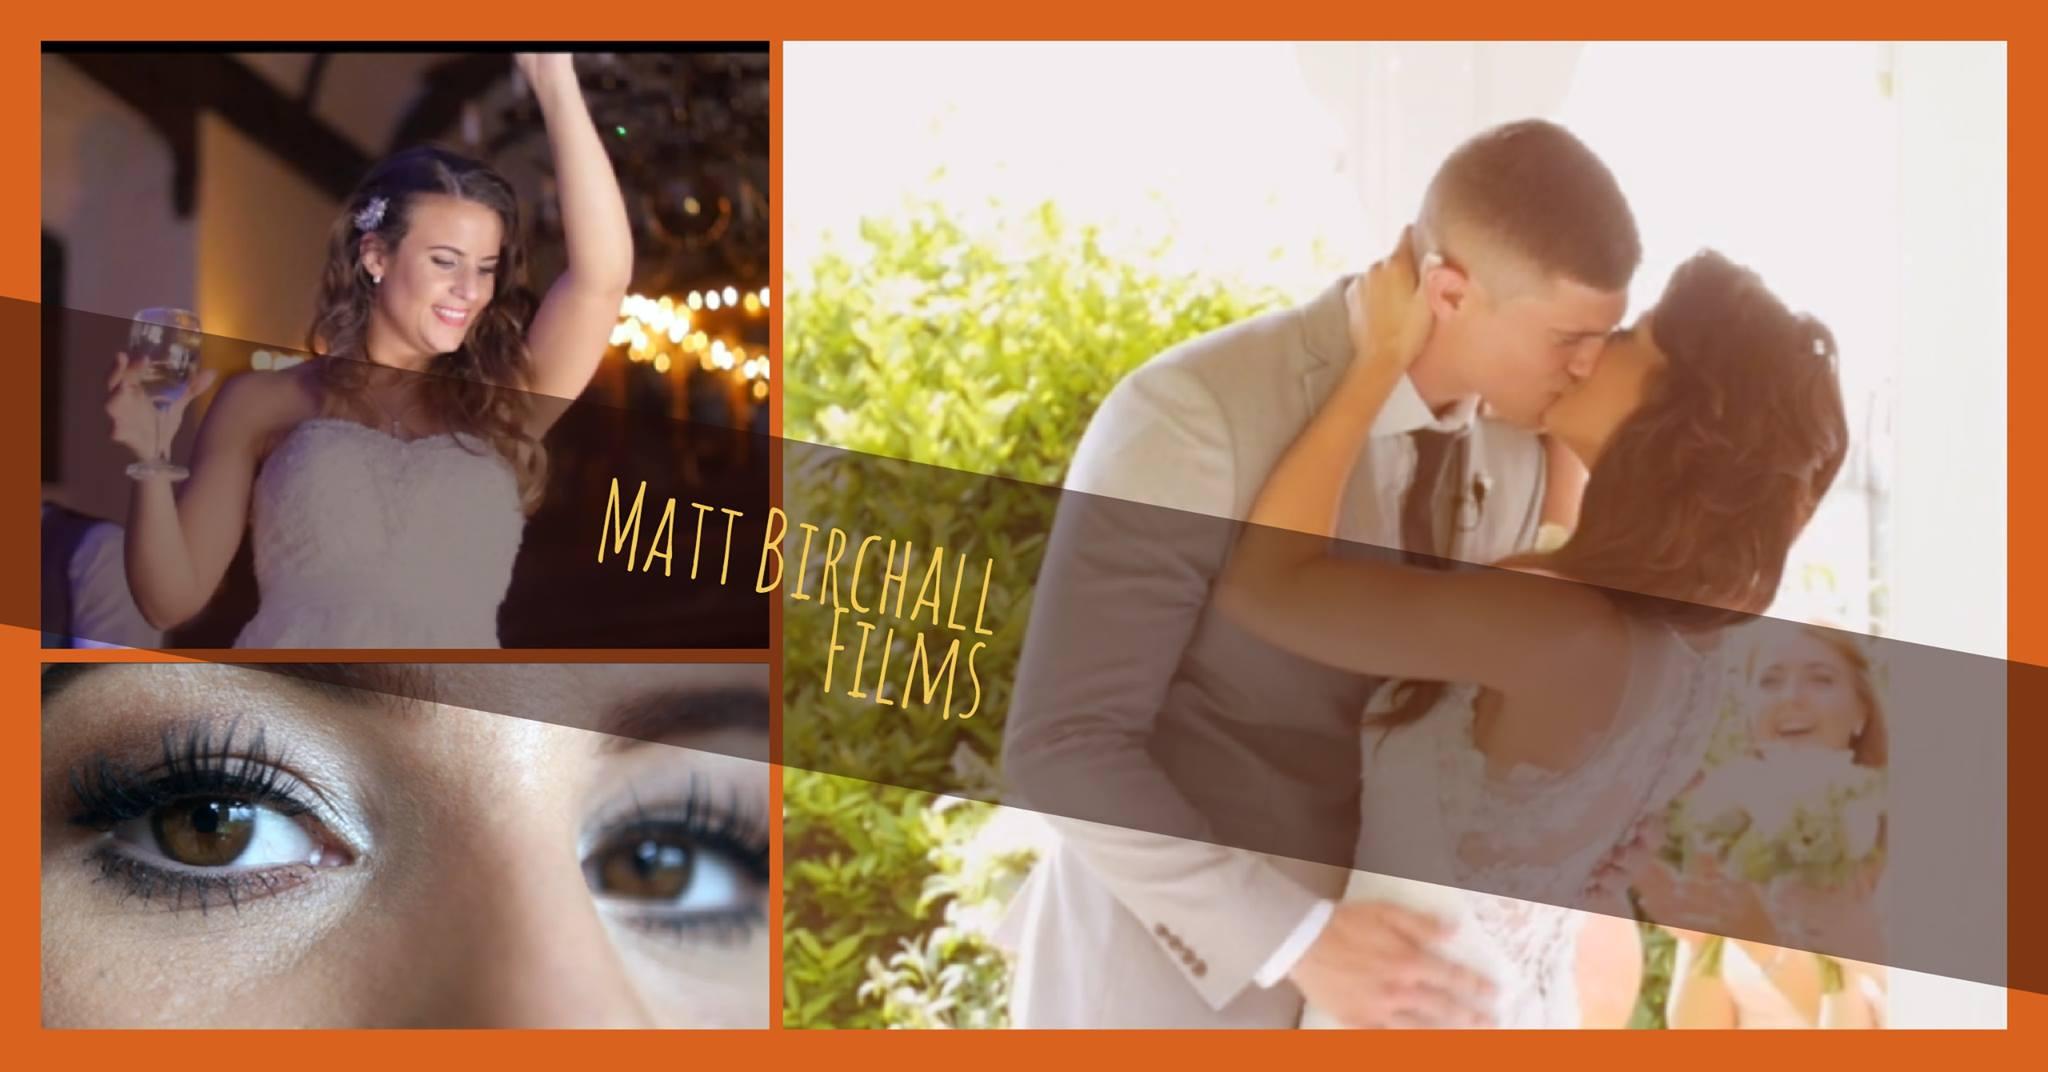 Matt Birchall Films